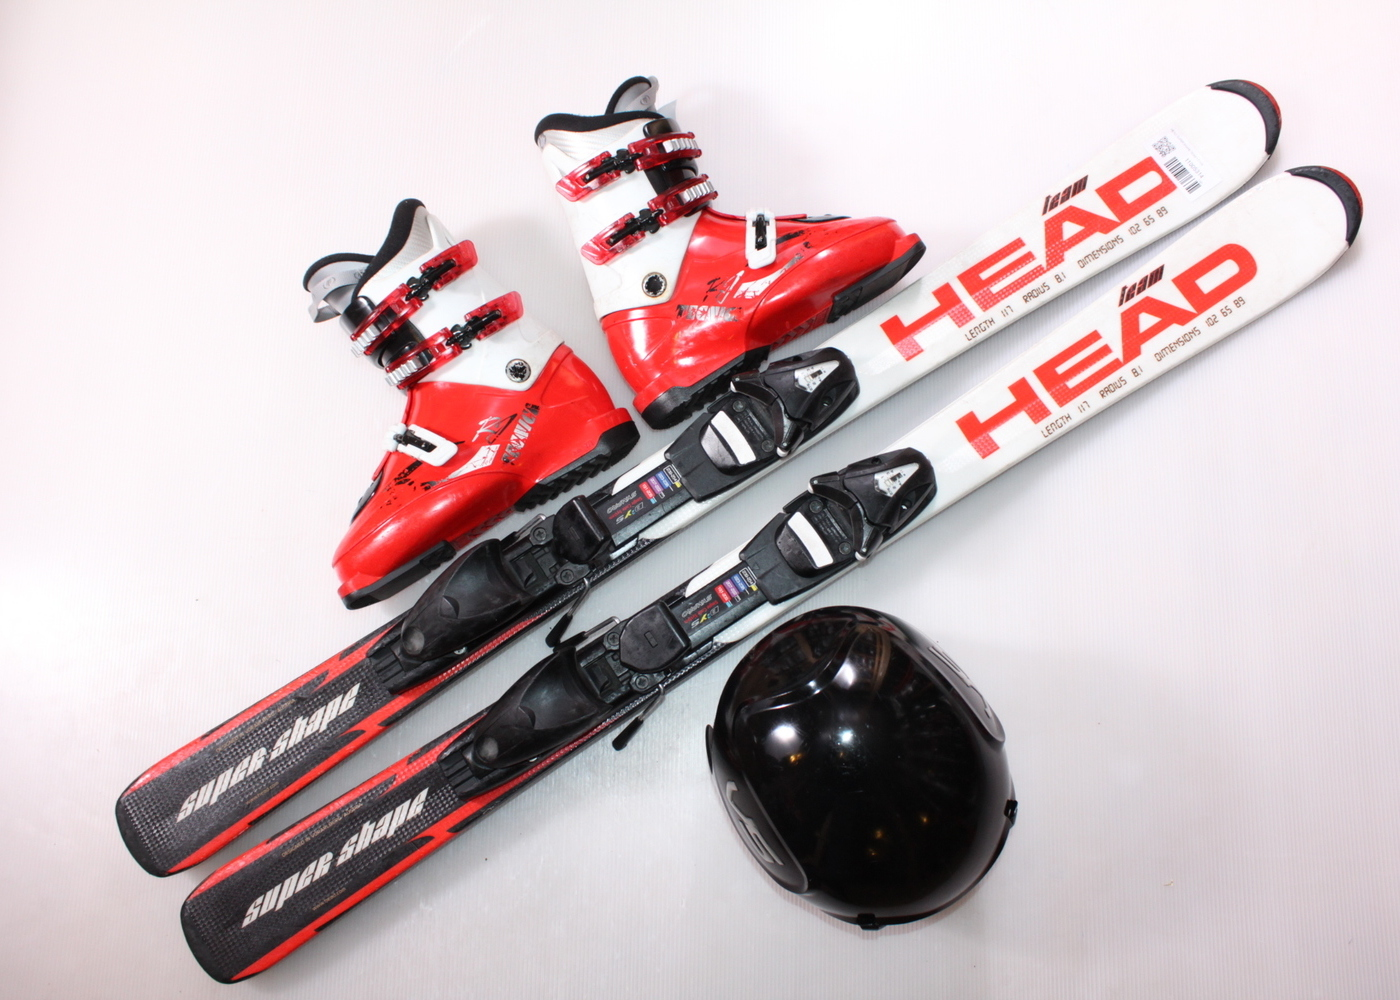 Dětské lyže HEAD SUPERSHAPE TEAM 117 cm + lyžáky  36.5EU + helma